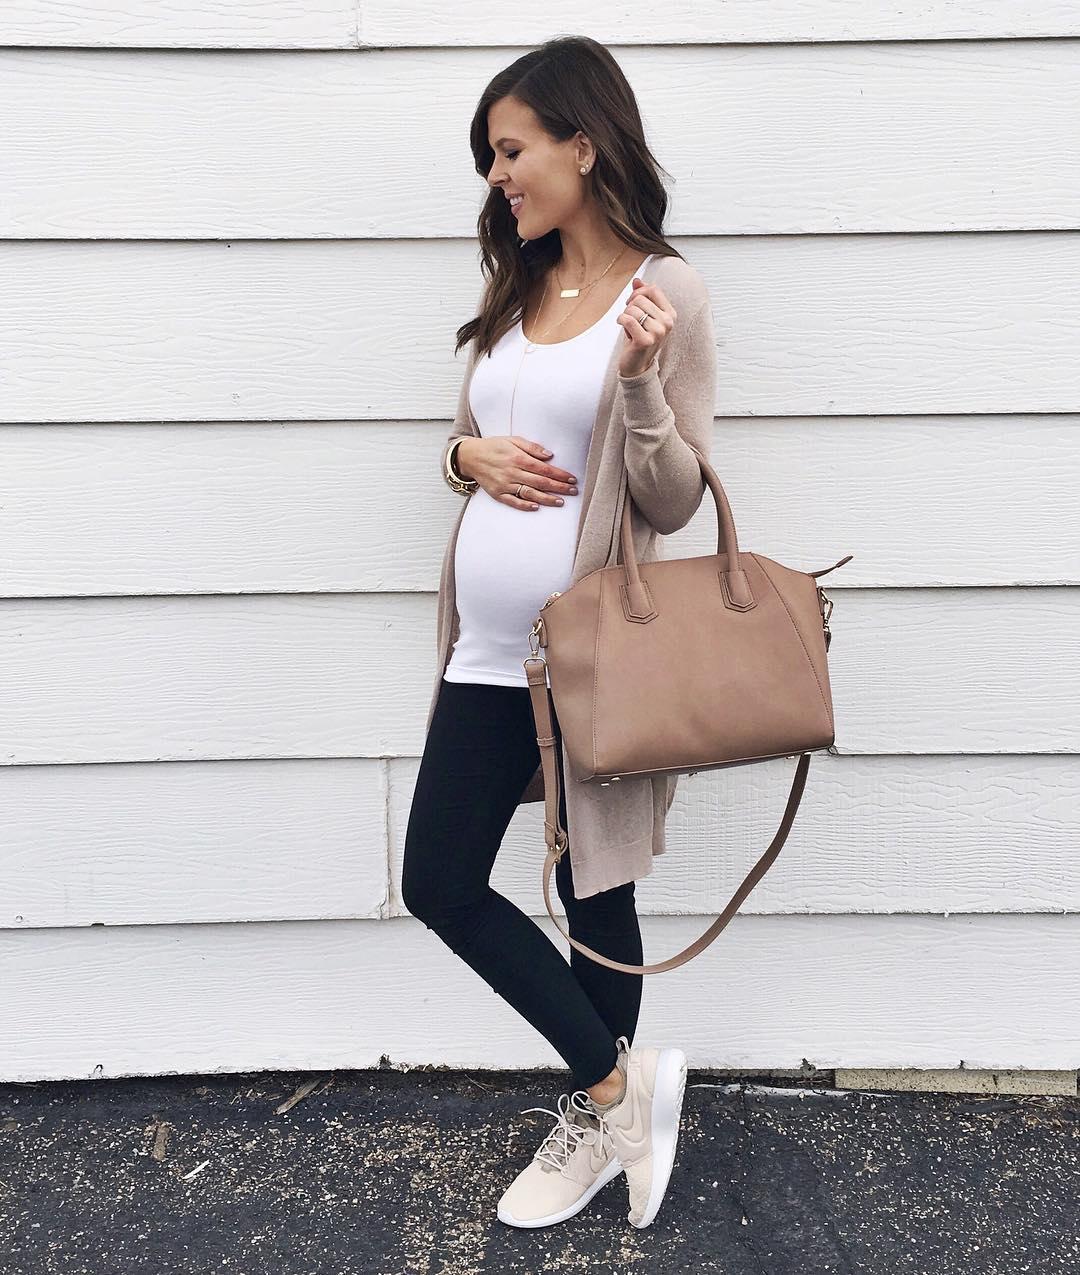 ce2e8b618bcf0 Instagram Roundup - Brie Bemis Rearick